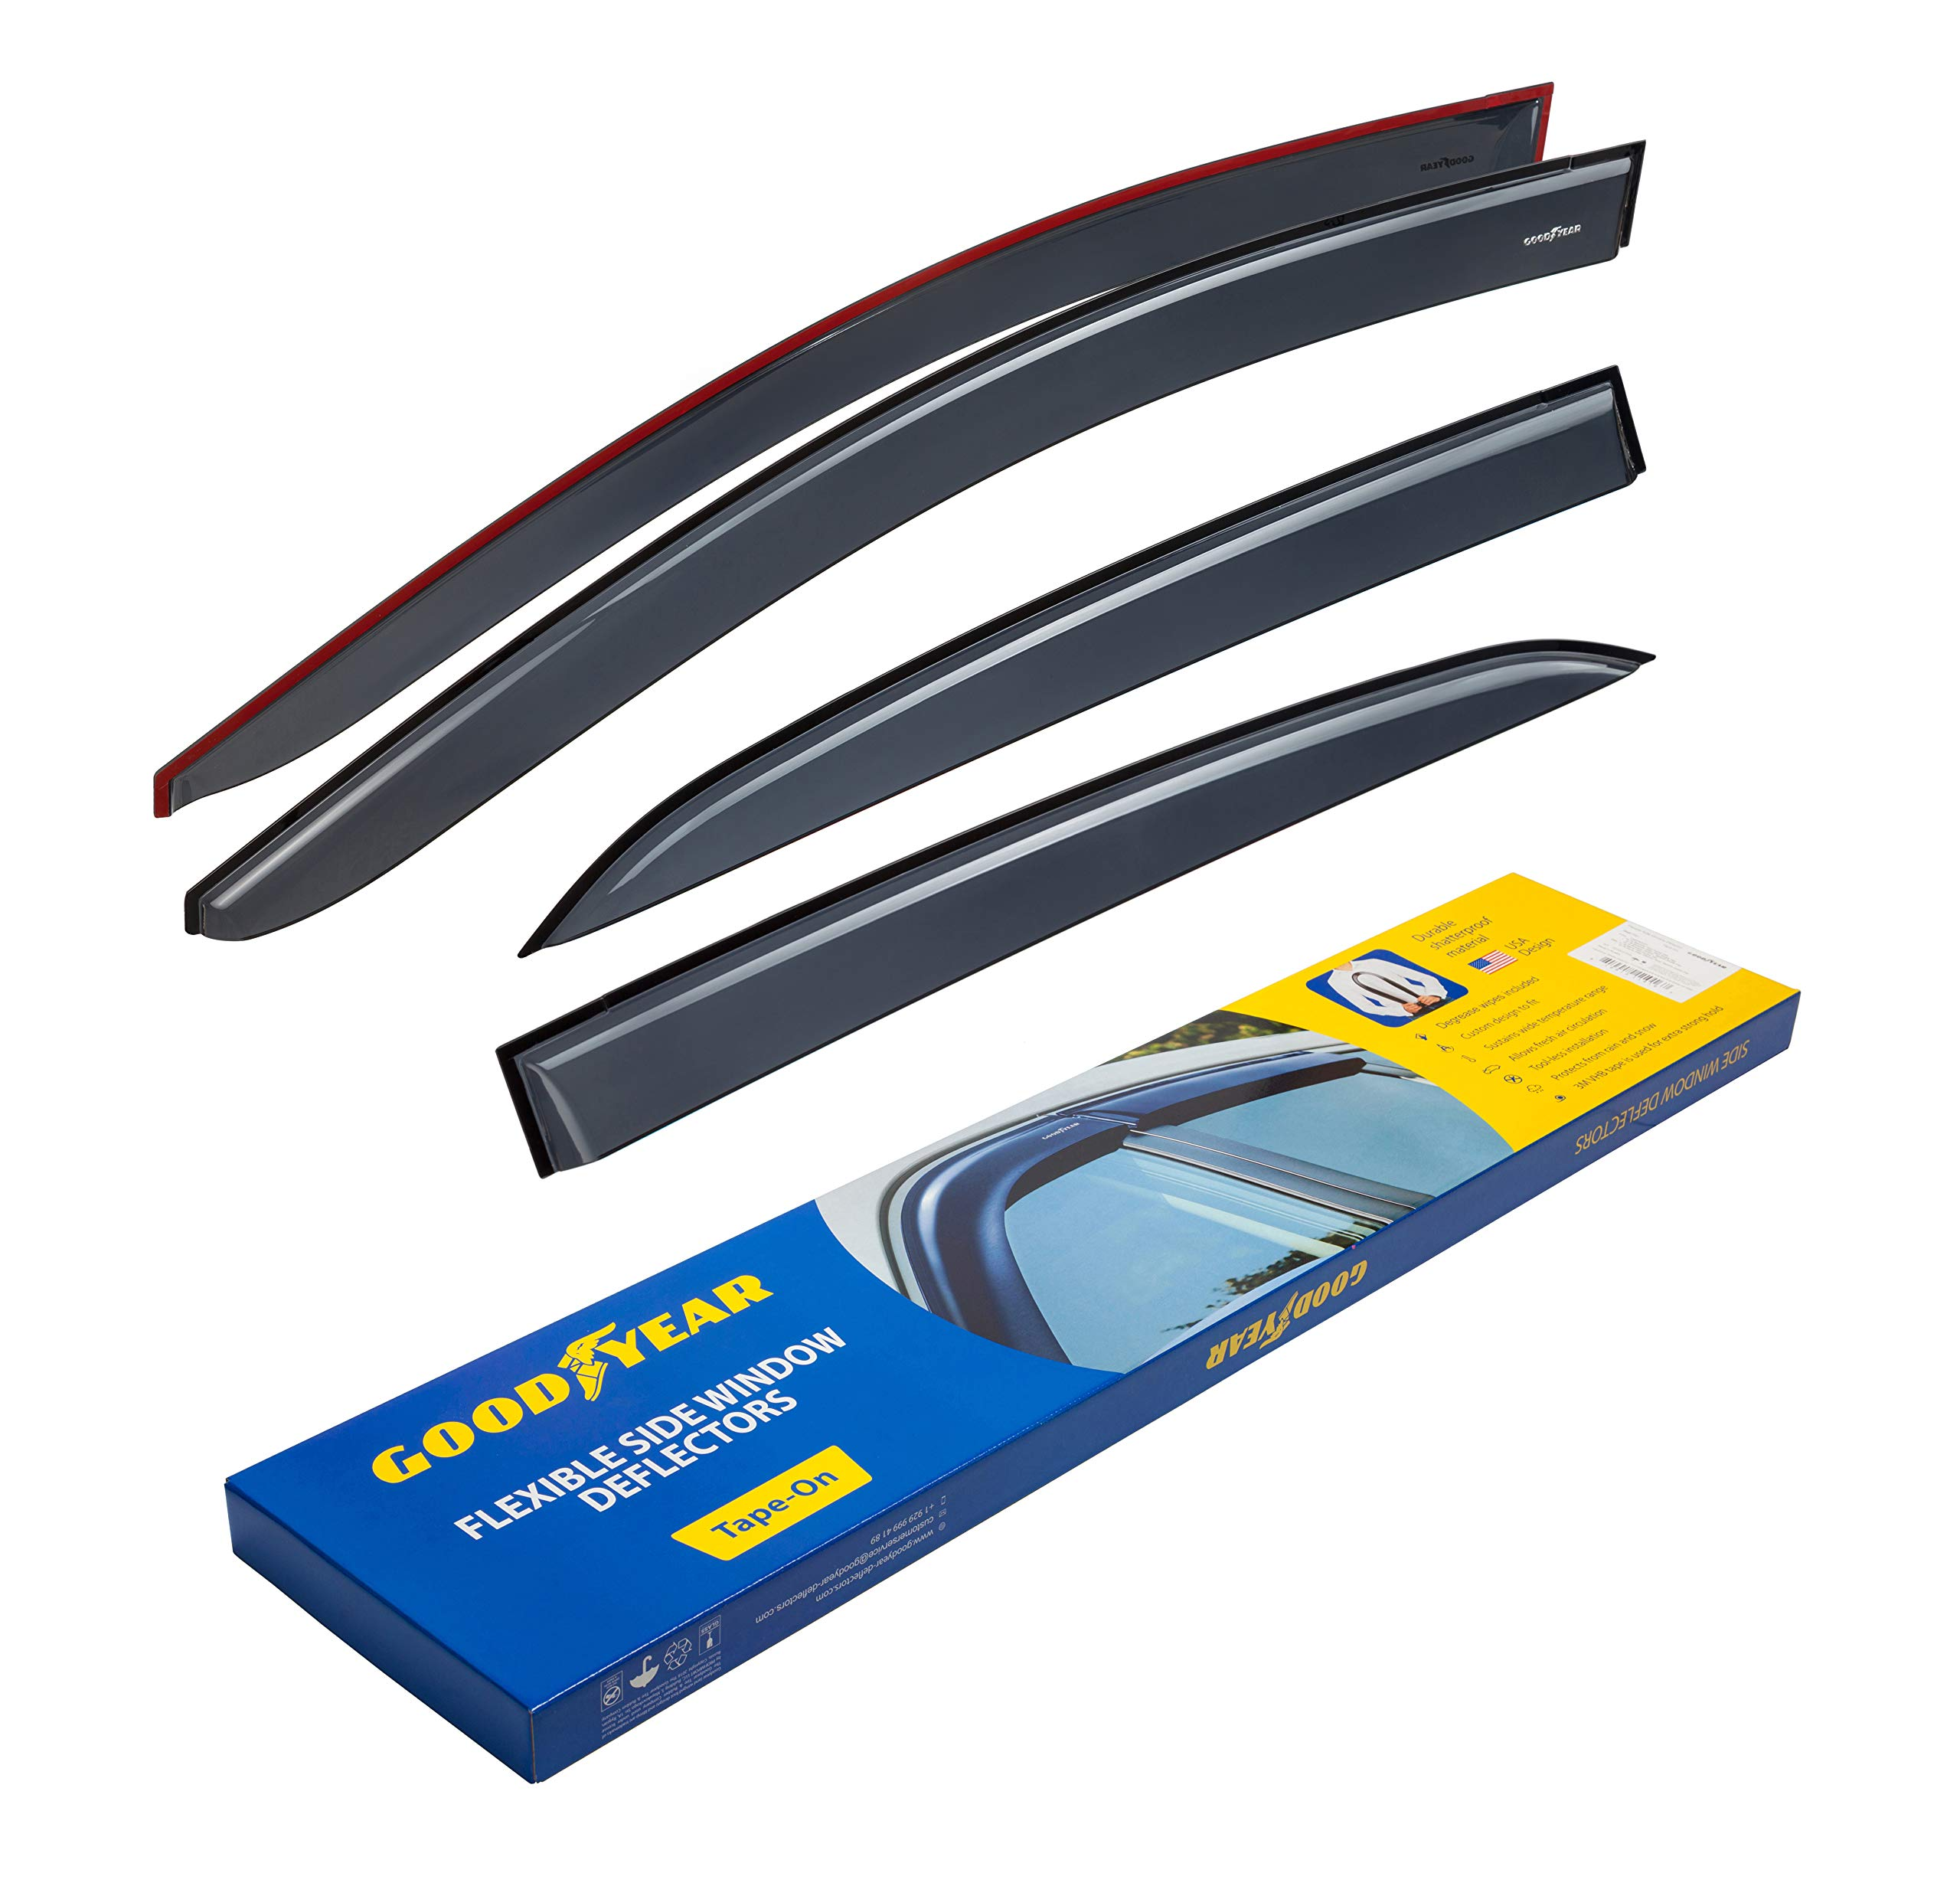 Goodyear Shatterproof Side Window Deflectors for Toyota Corolla Sedan 2014-2019, Tape-on Rain Guards, Vent Window Visors, 4 Pieces - GY003116 by Goodyear